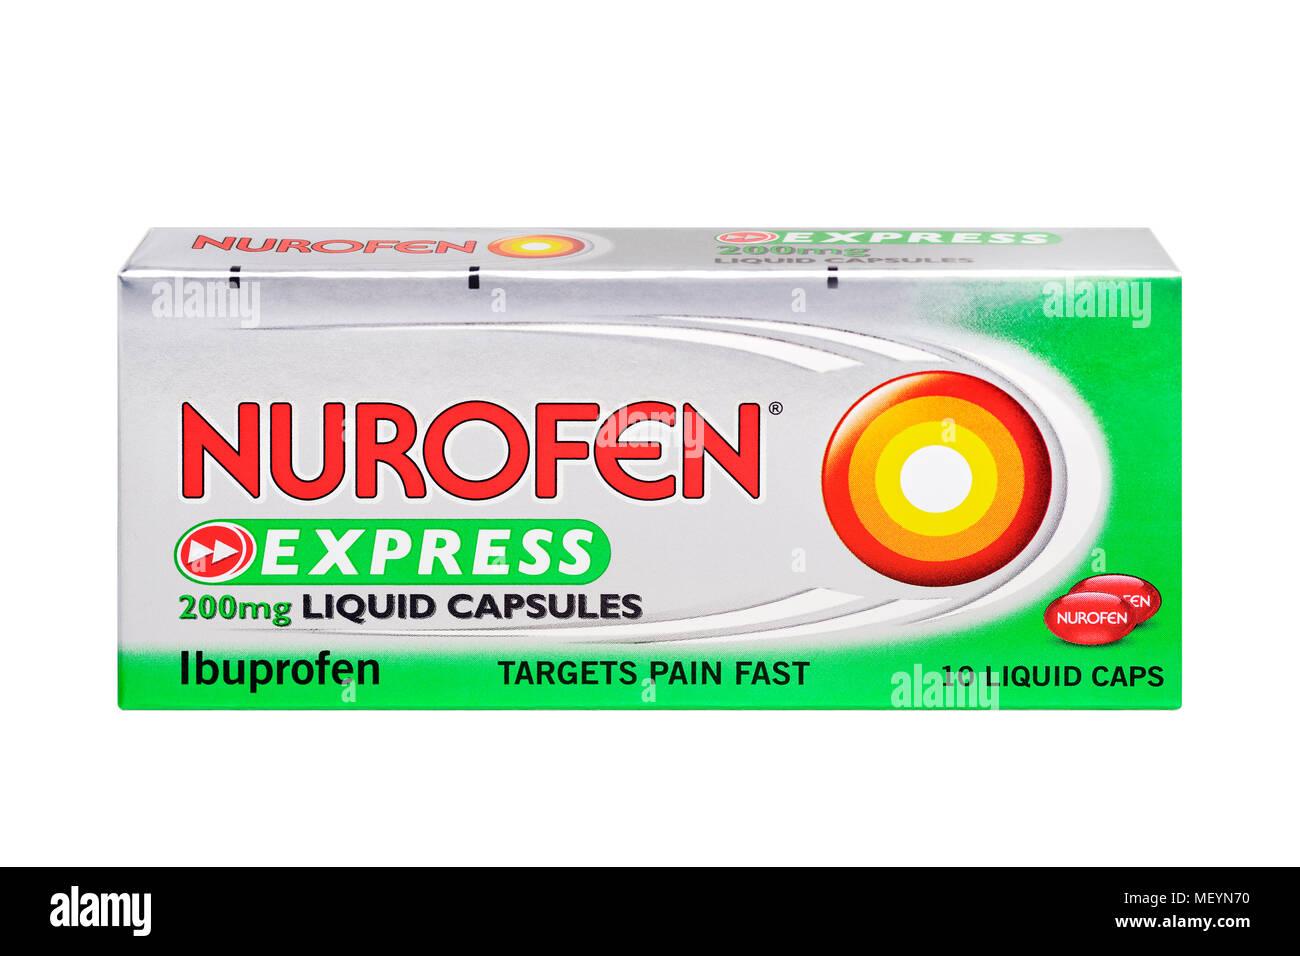 Nurofen Express Box, Cut Out - Stock Image